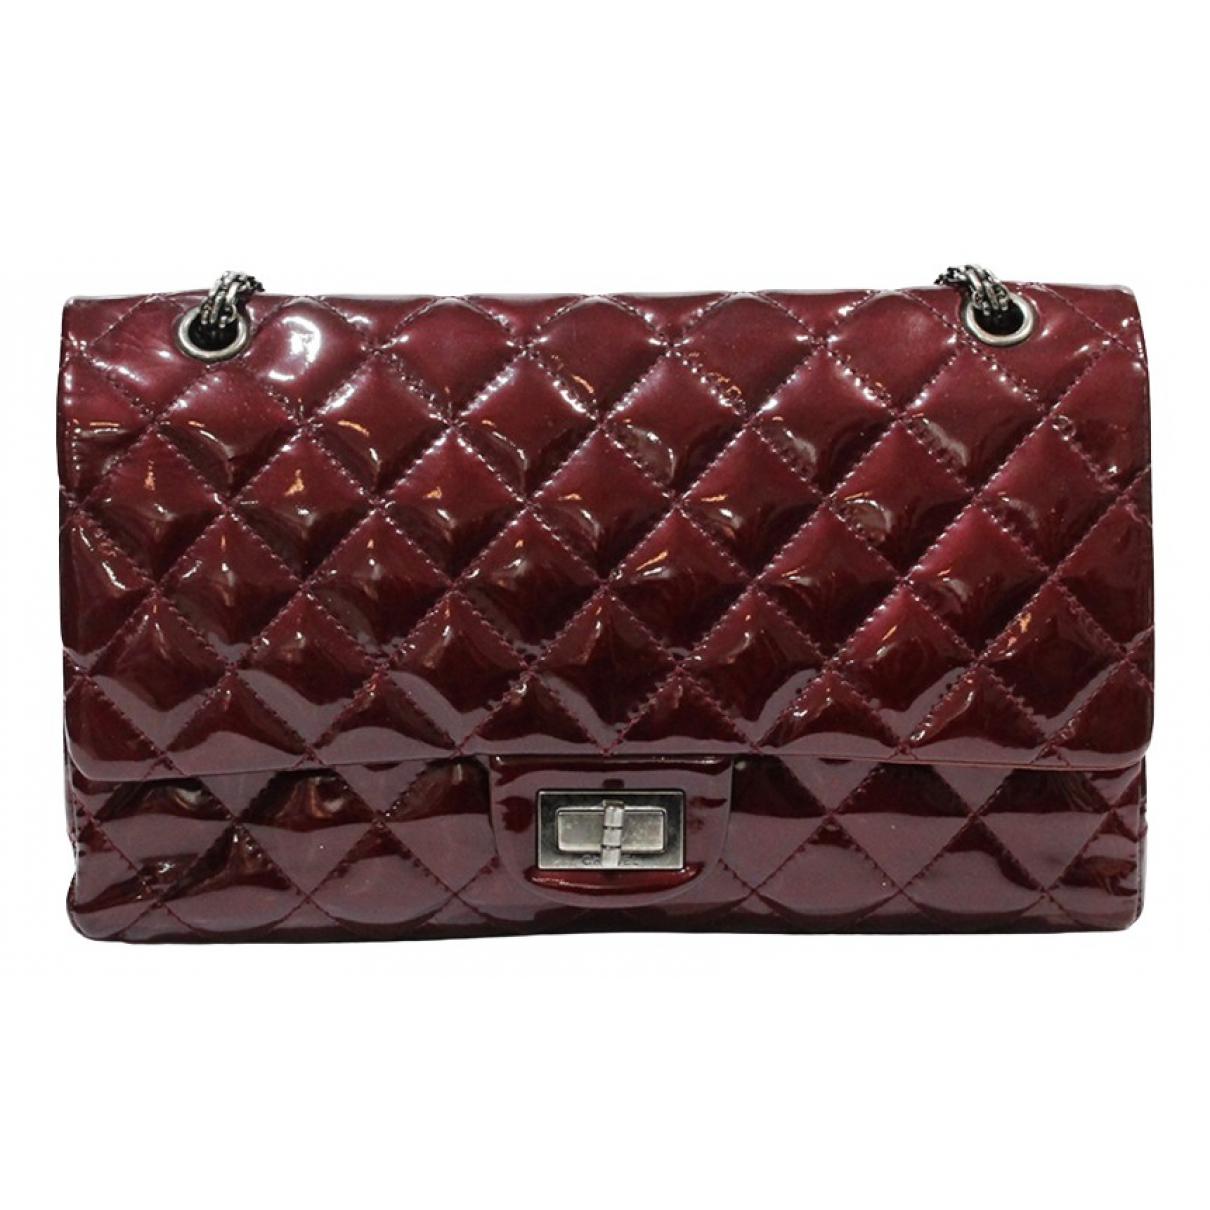 Chanel 2.55 Handtasche in  Bordeauxrot Lackleder